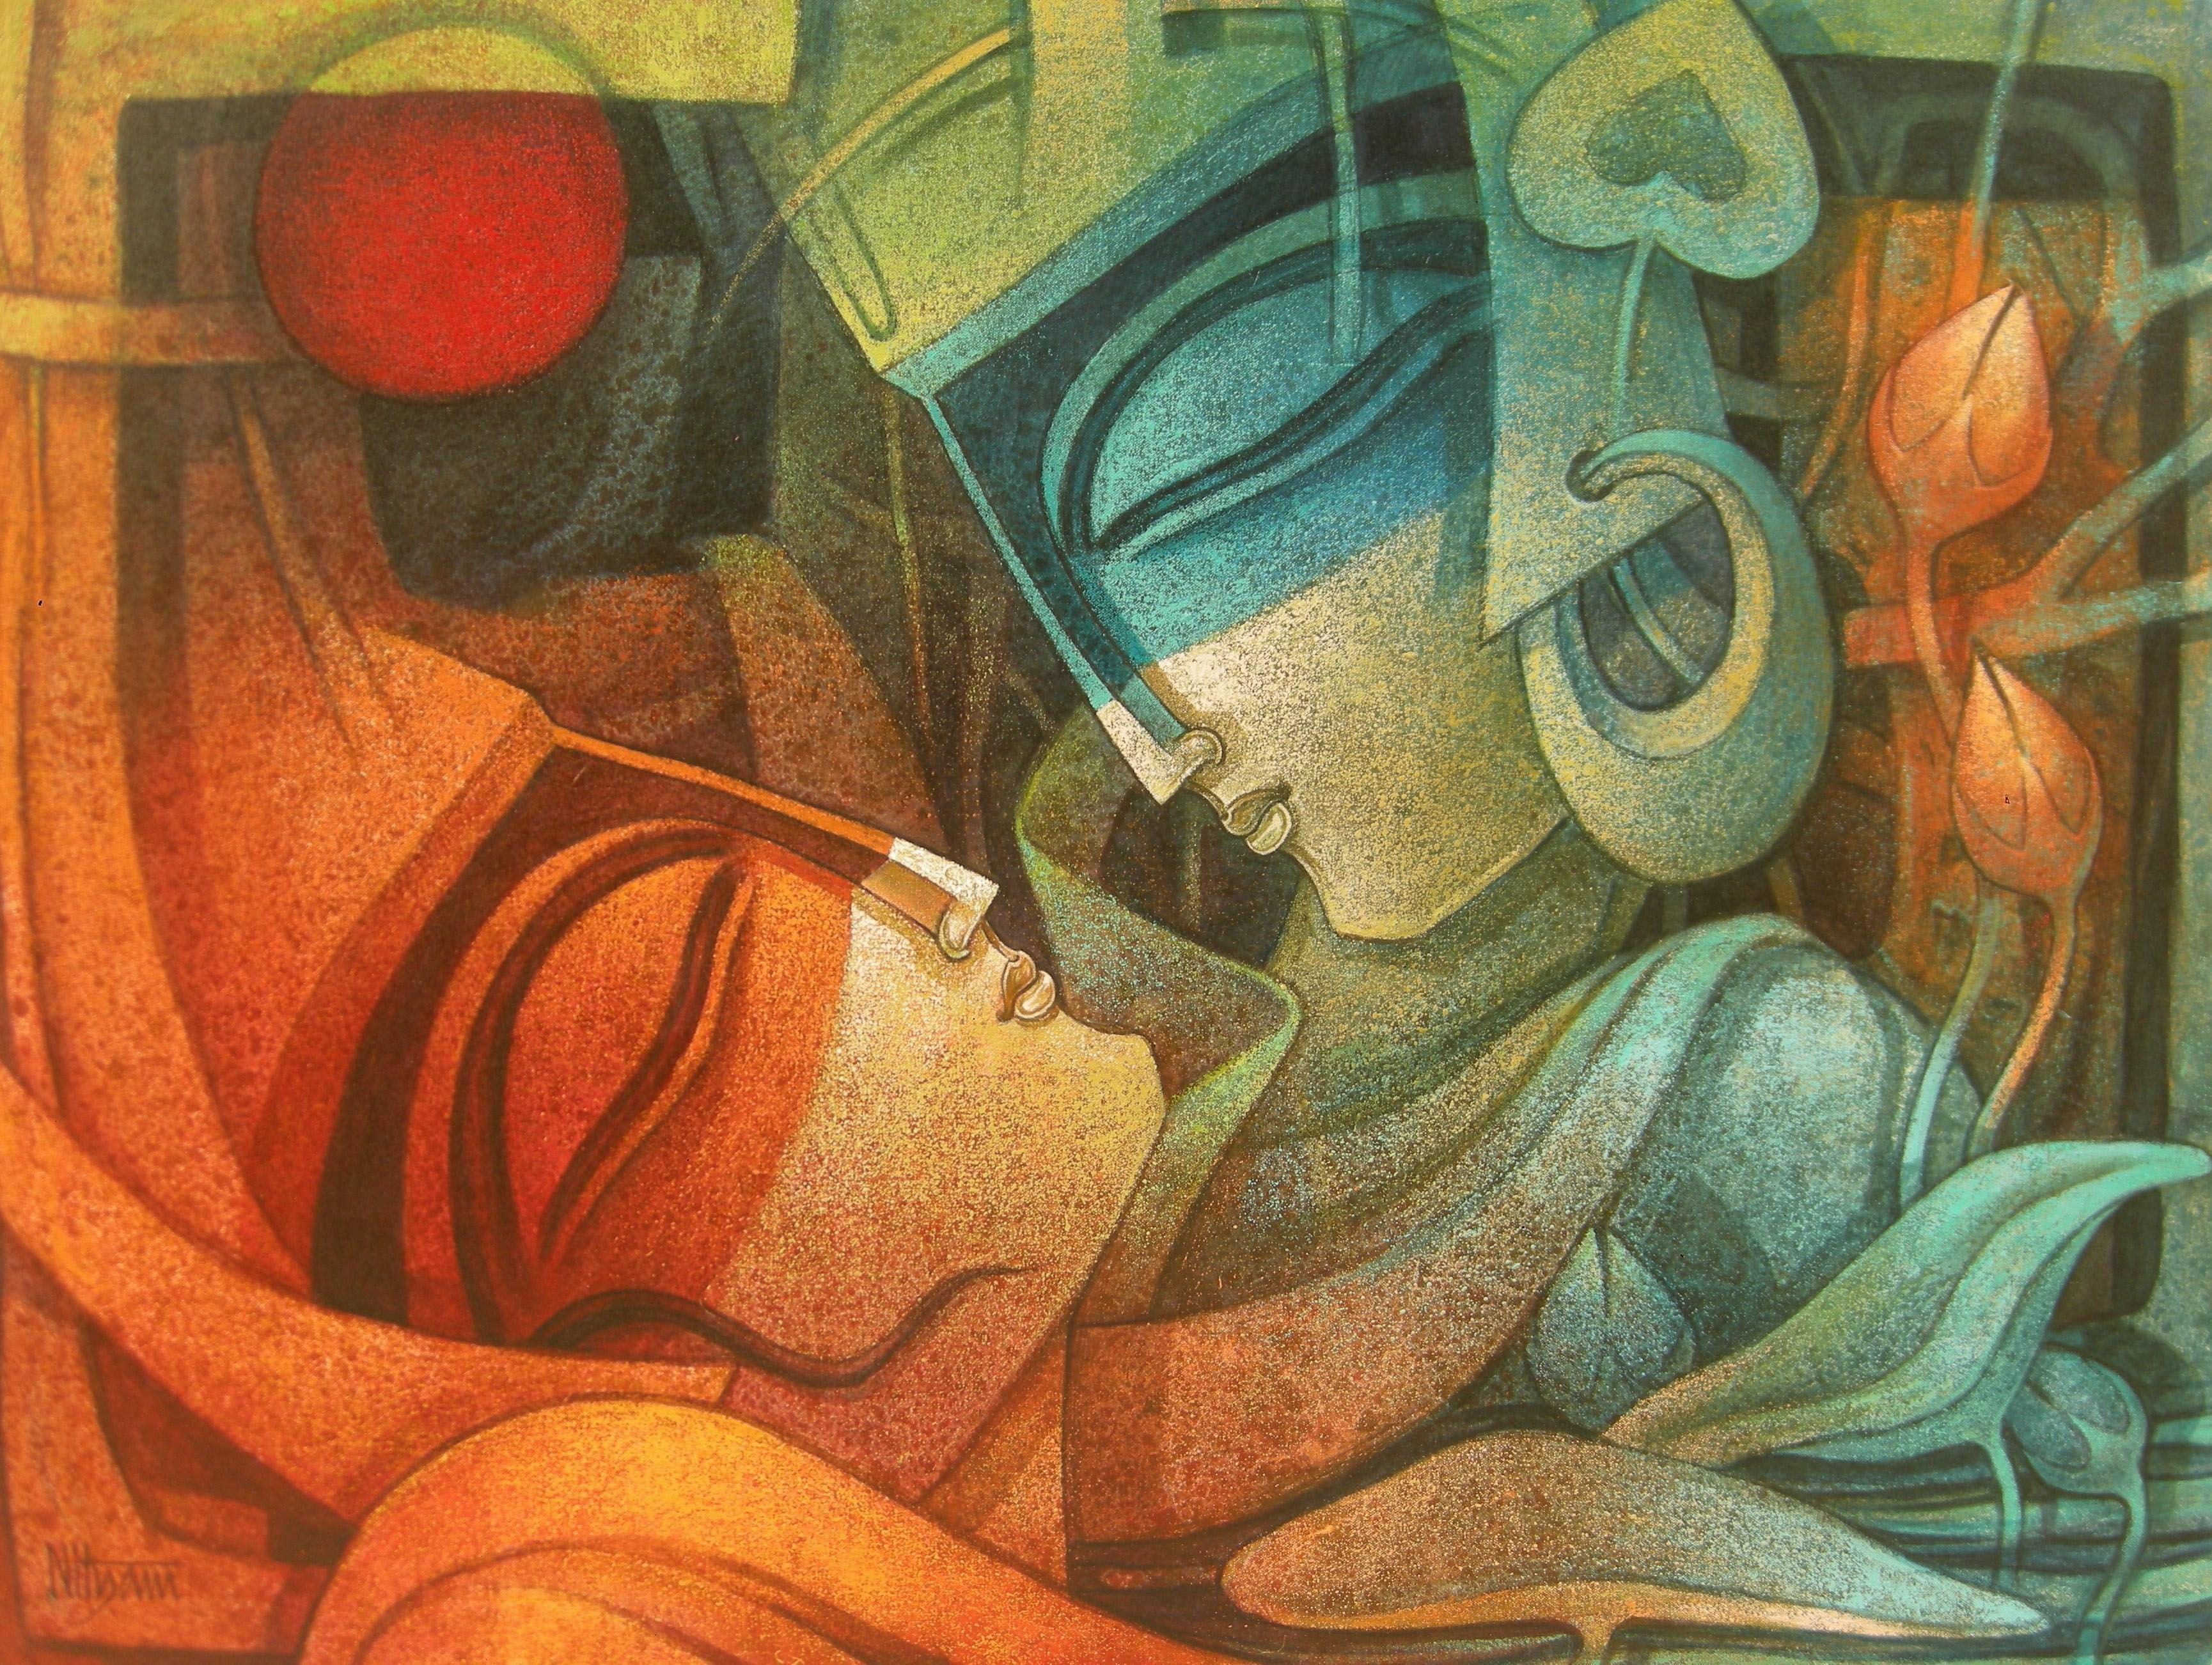 d014c8c2a Home|Online Art Gallery|Art Gallery India|Indian Art Gallery Art Visage,